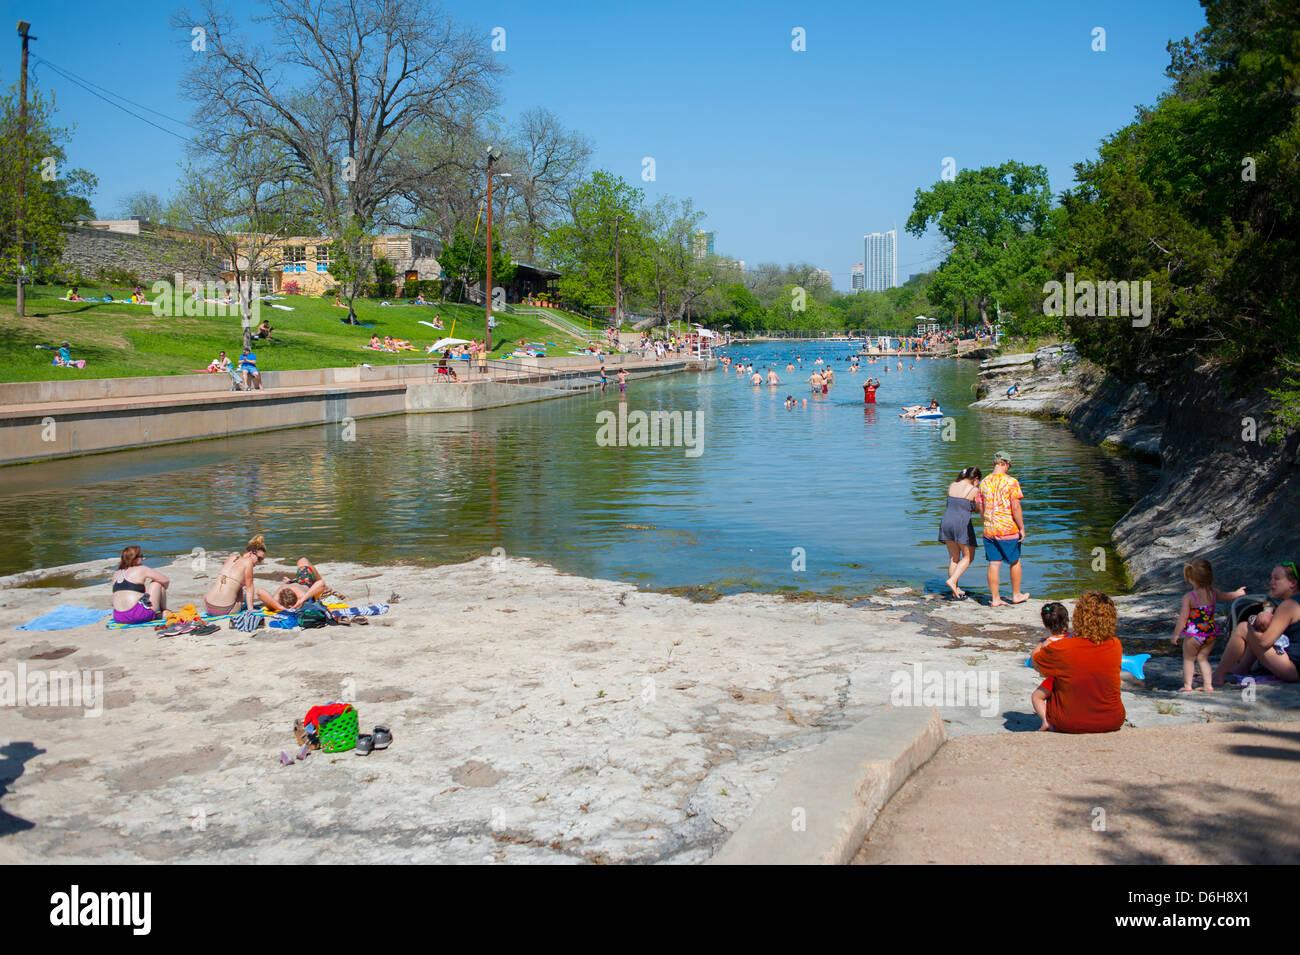 Usa Texas Tx Austin Barton Springs Pool In Zilker Park Natural Spring Stock Photo Royalty Free